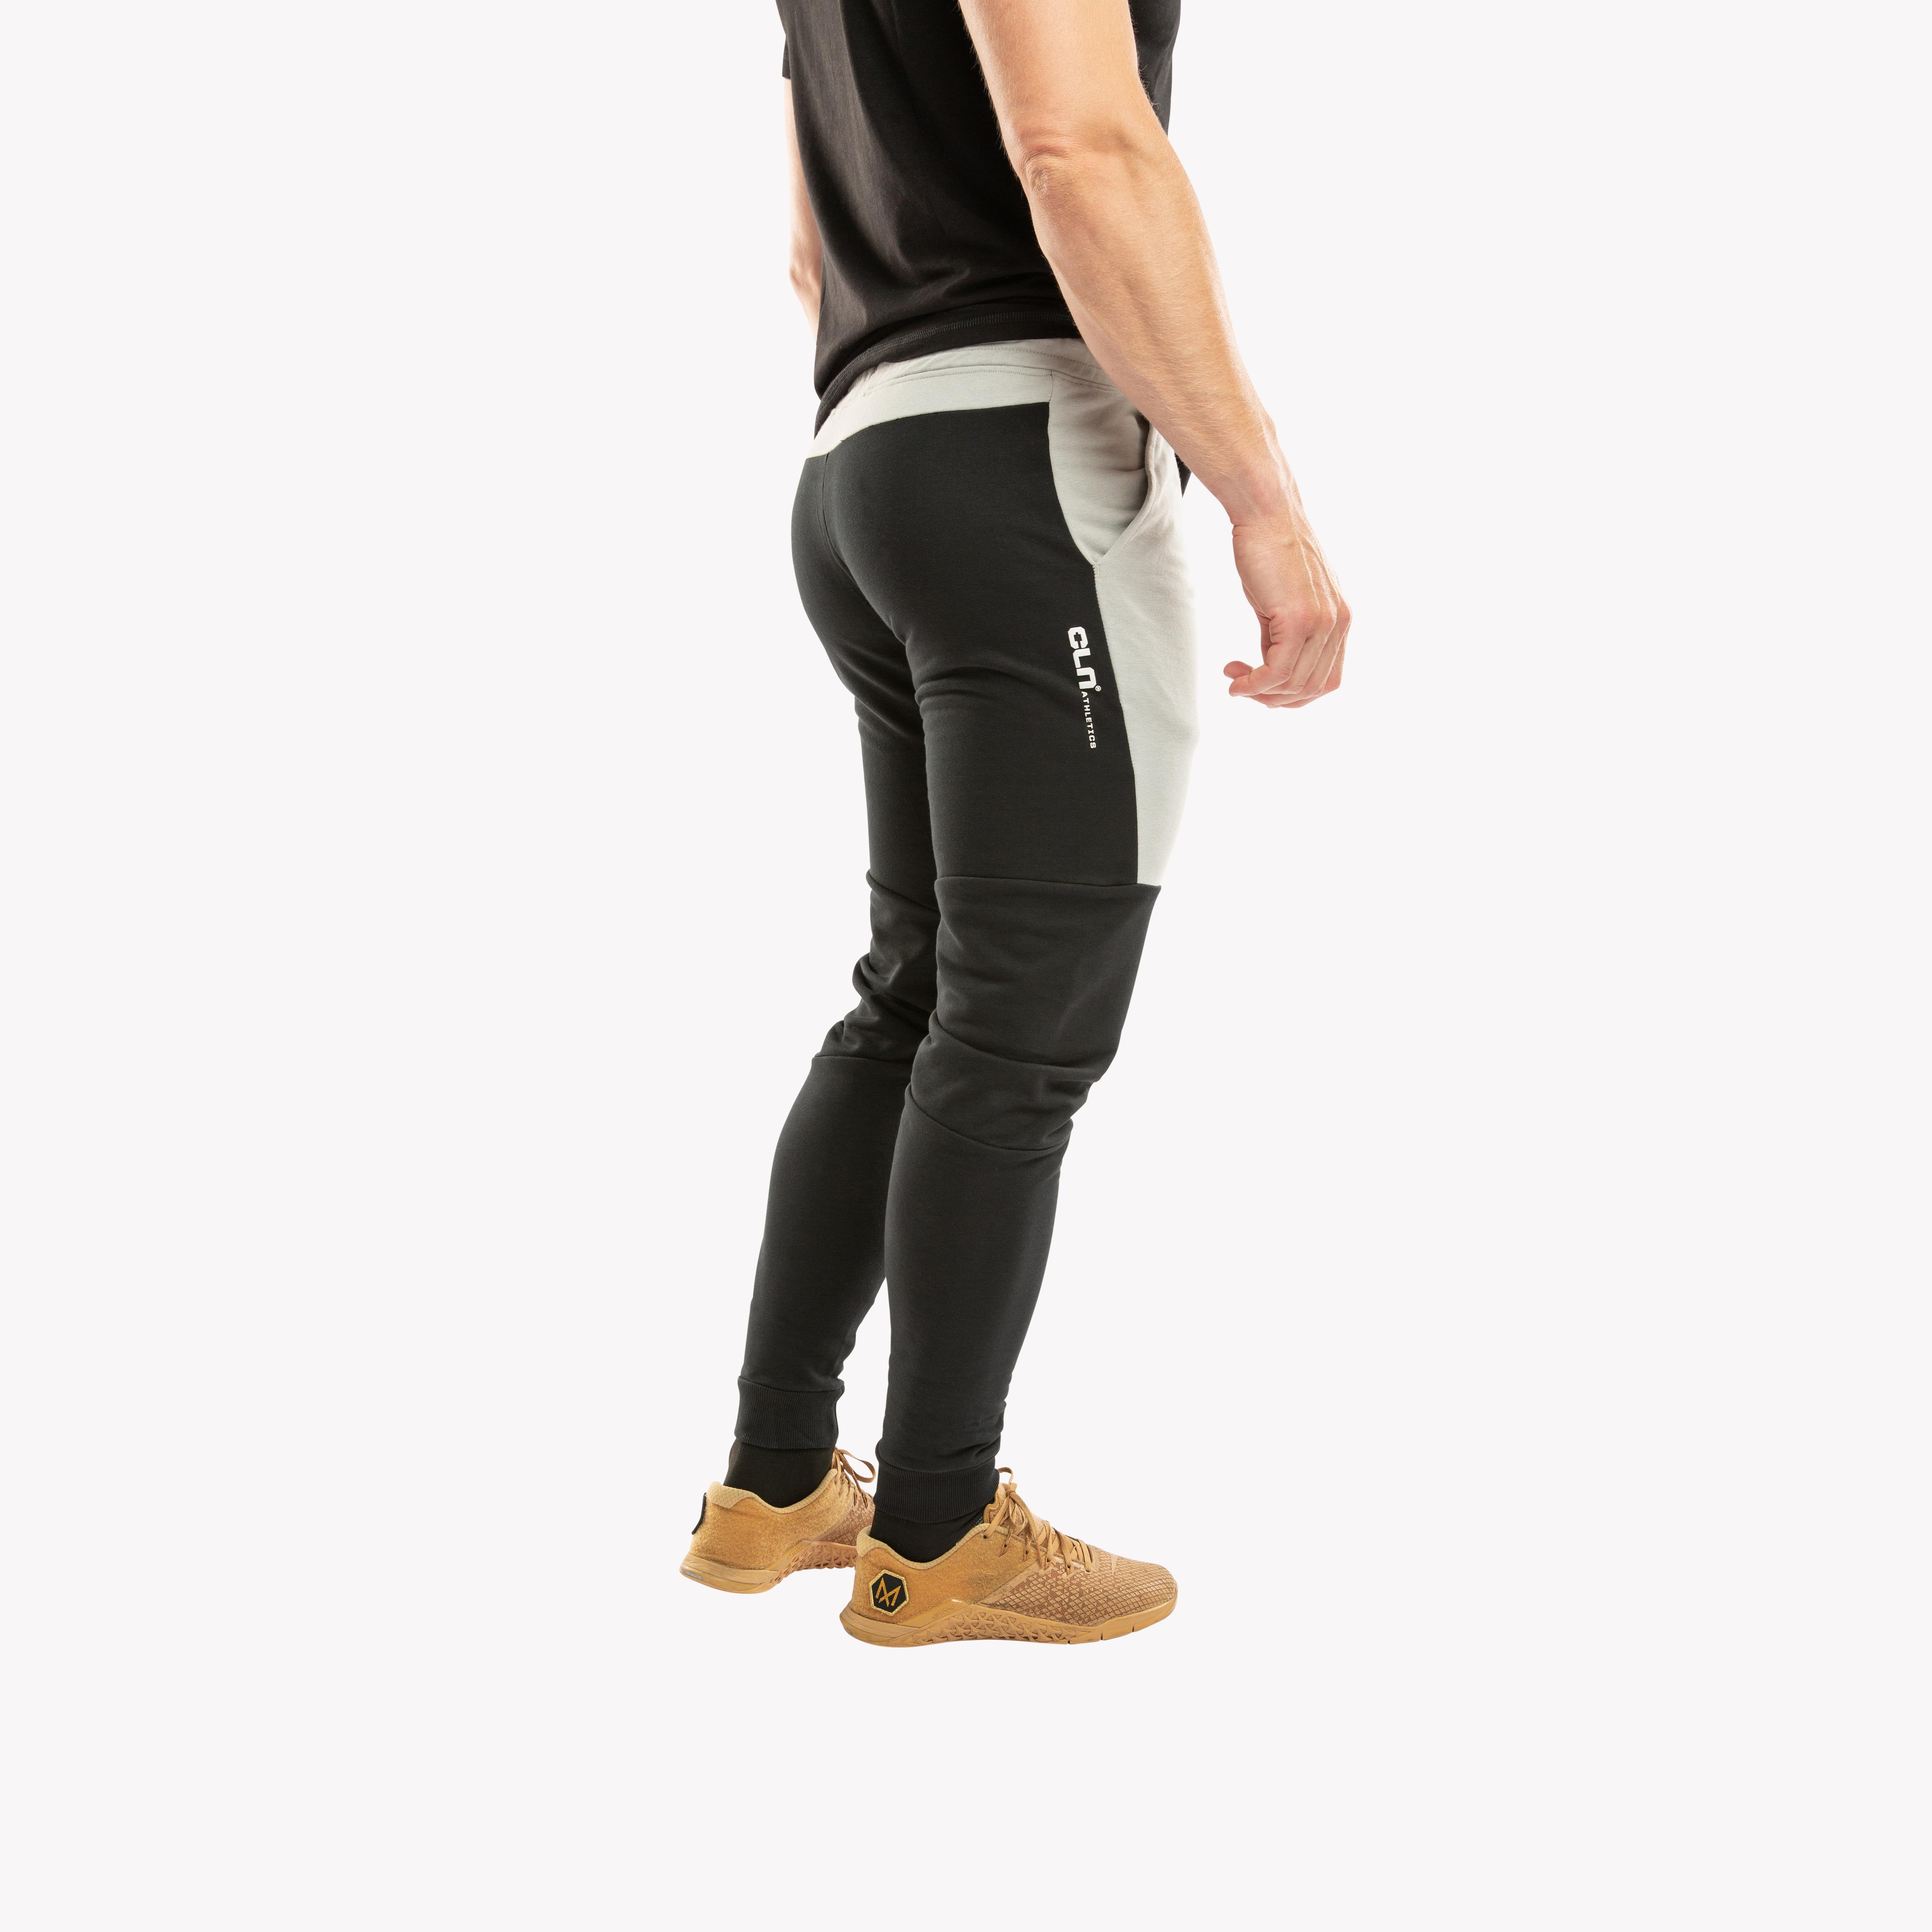 CLN Redirect unisex Pants Grey